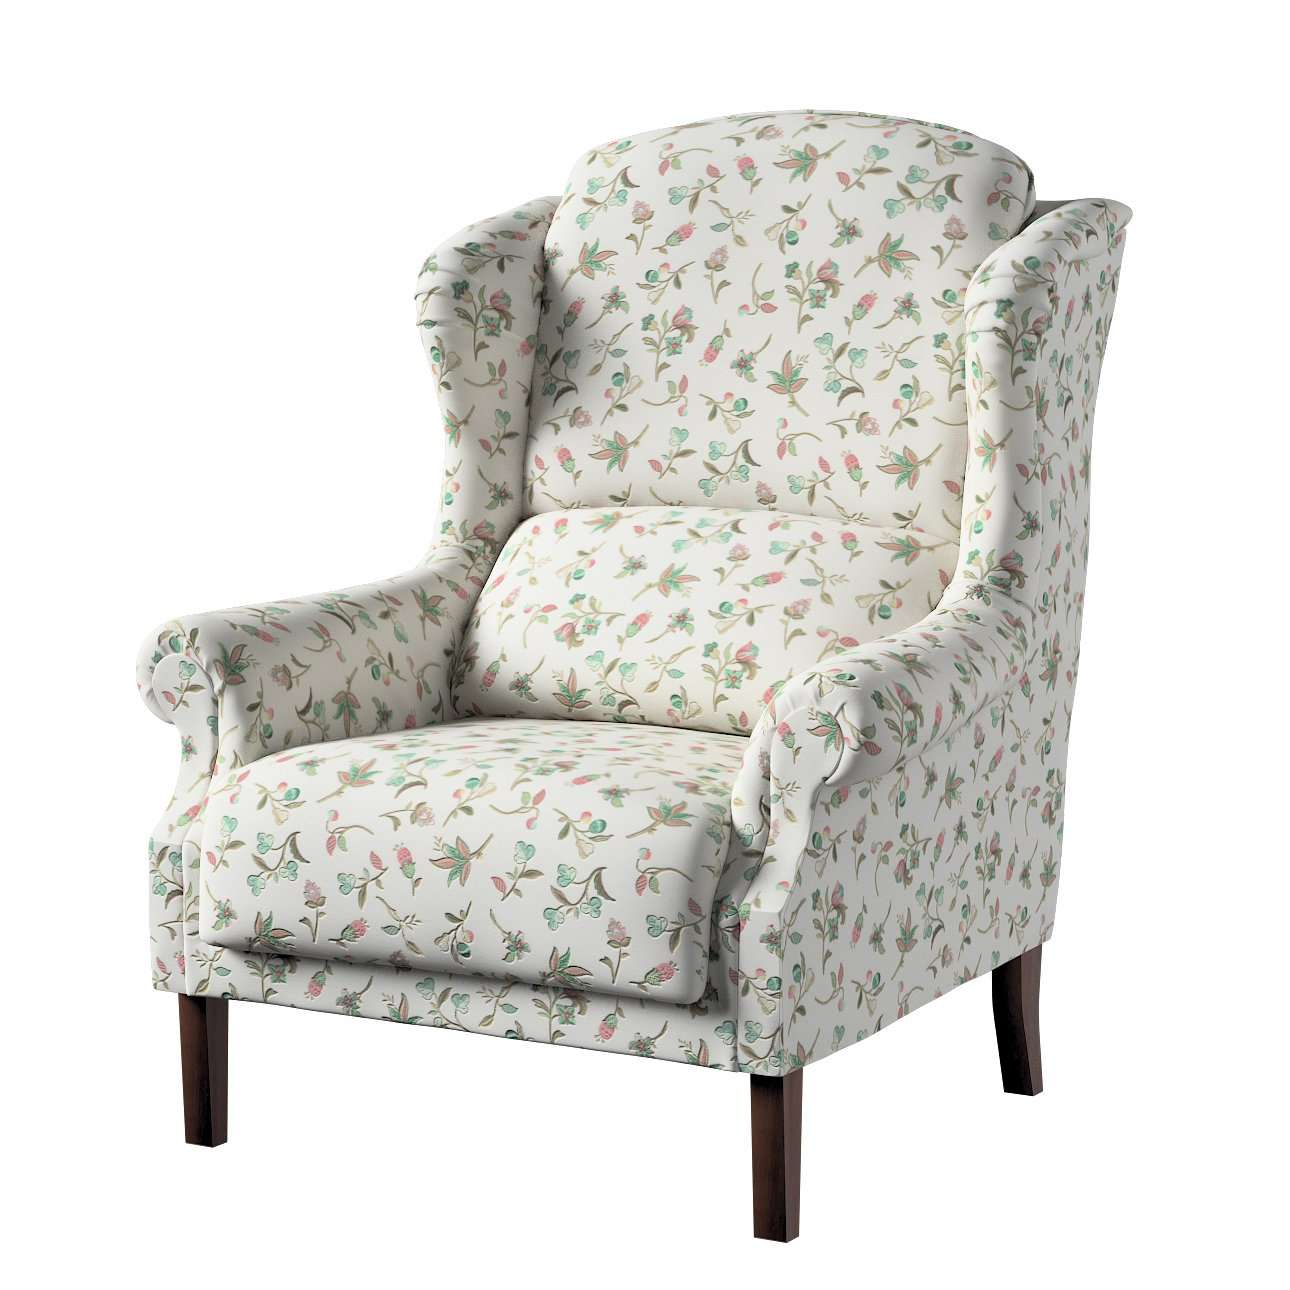 Stilingas Dekoria fotelis 63 x 115 cm kolekcijoje Londres, audinys: 122-02